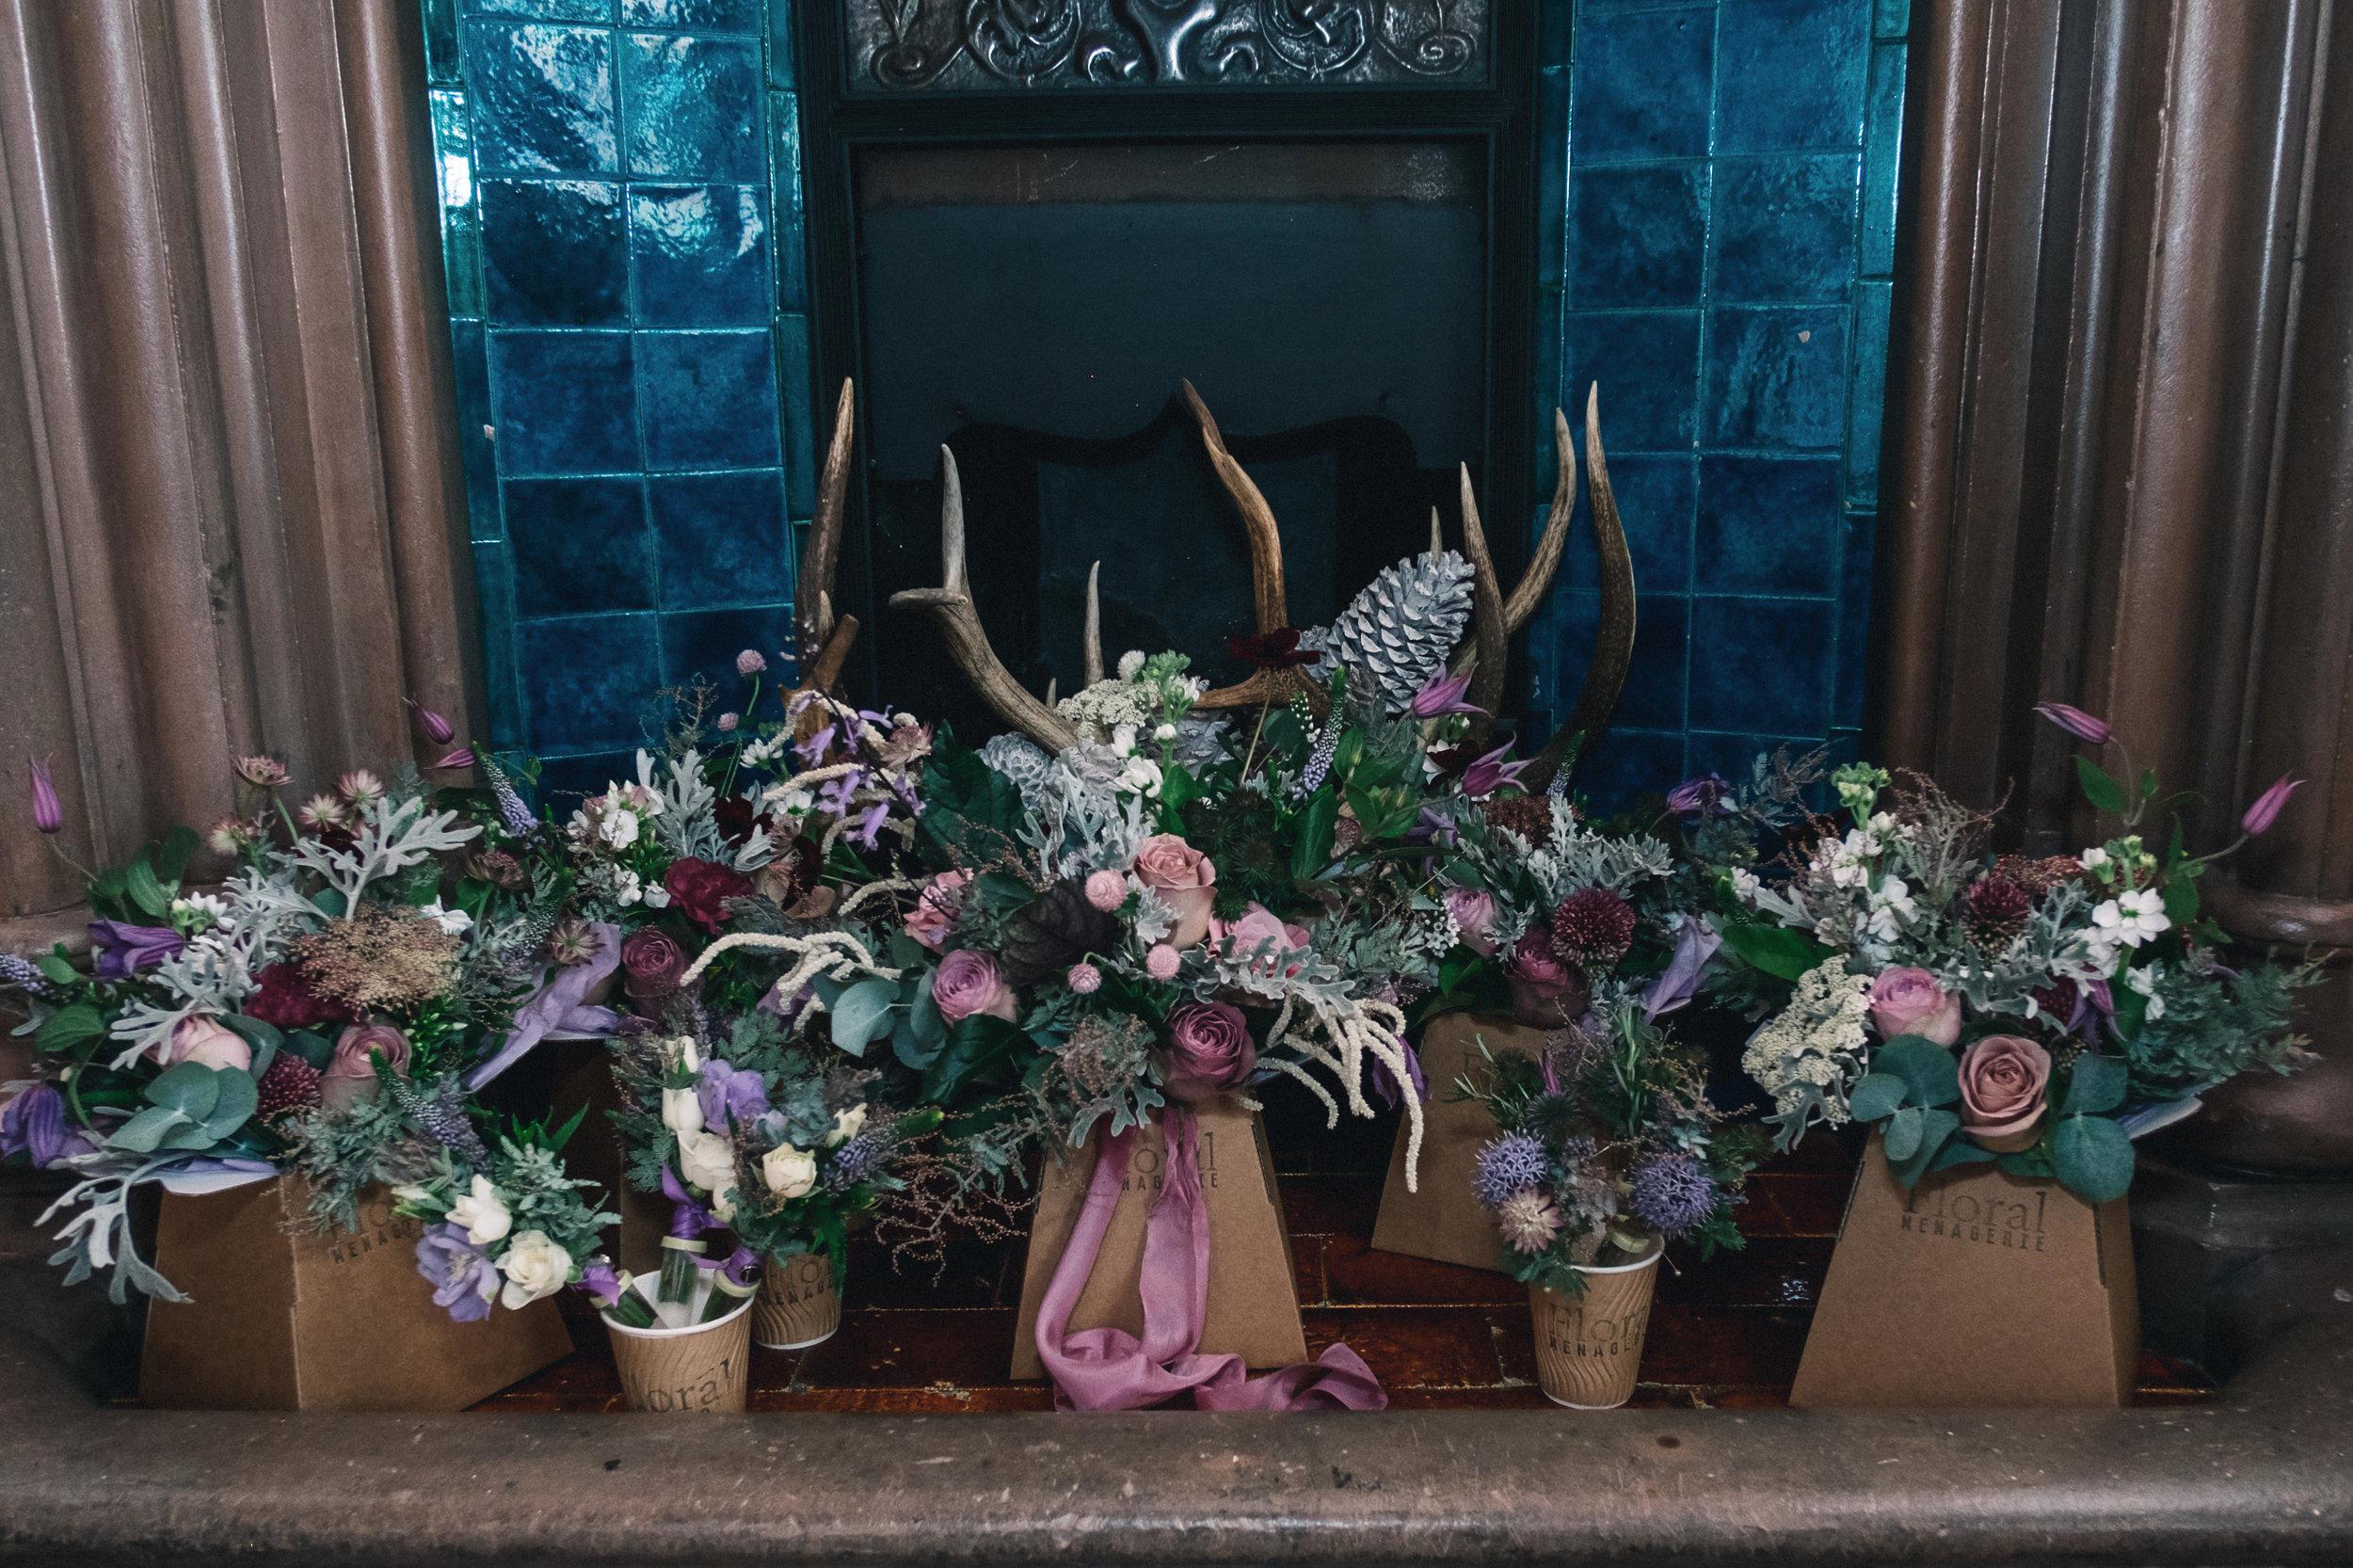 Arrangement of bridal flowers on fire place